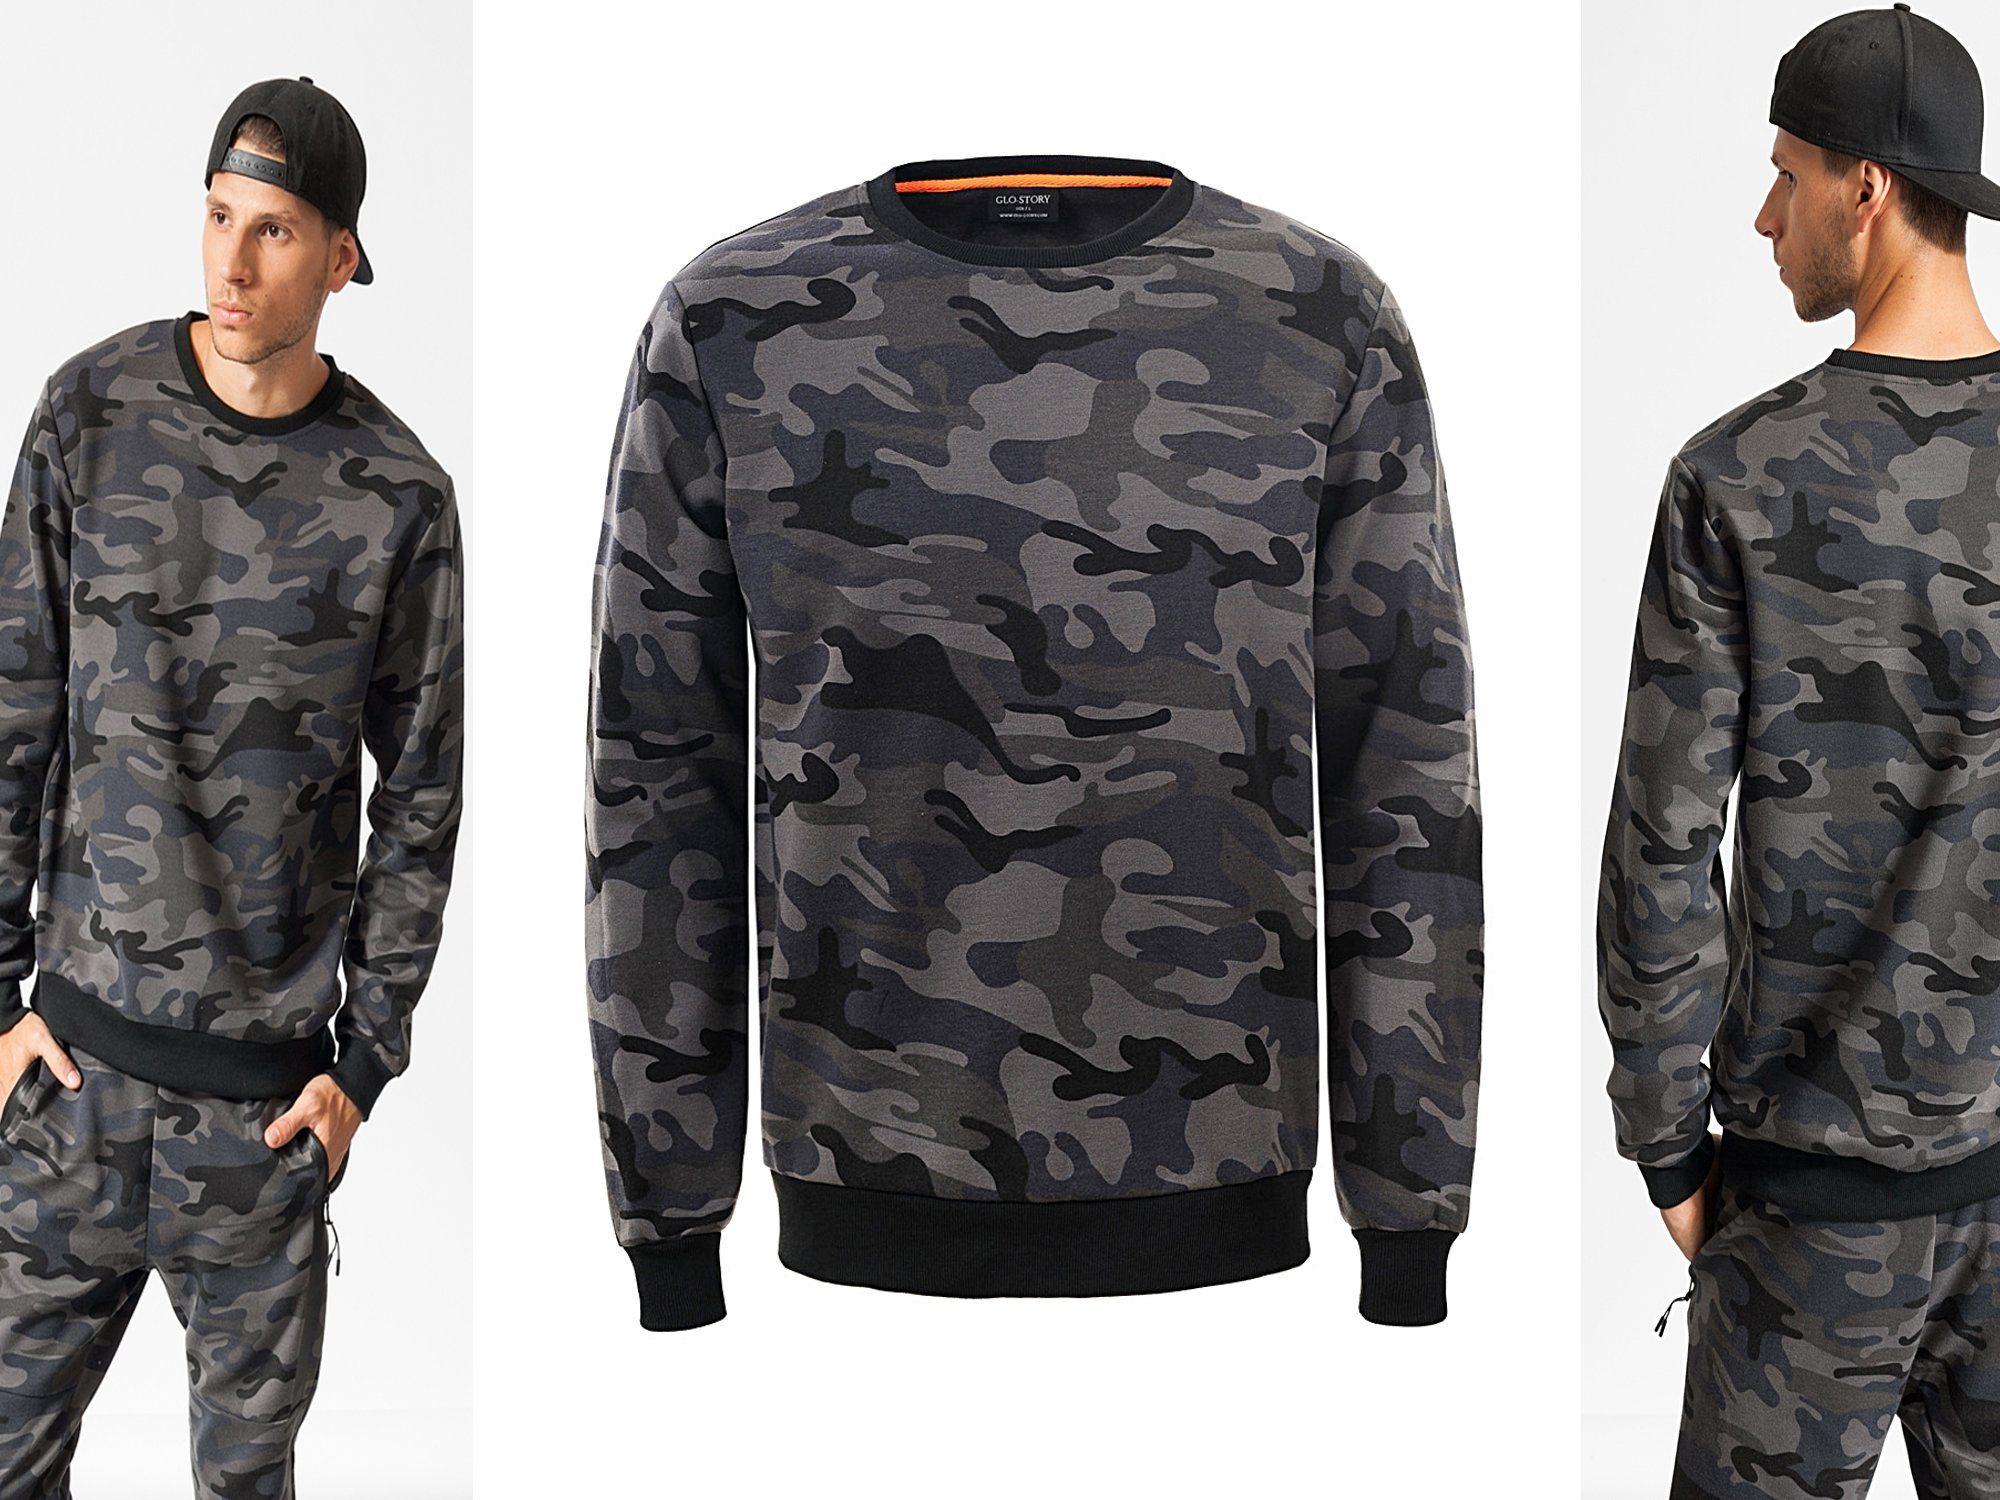 Moro Bluza Meska Moro Bluzka Moro Bez Kaptura Xl 6936960467 Oficjalne Archiwum Allegro Bomber Jacket Jackets Fashion